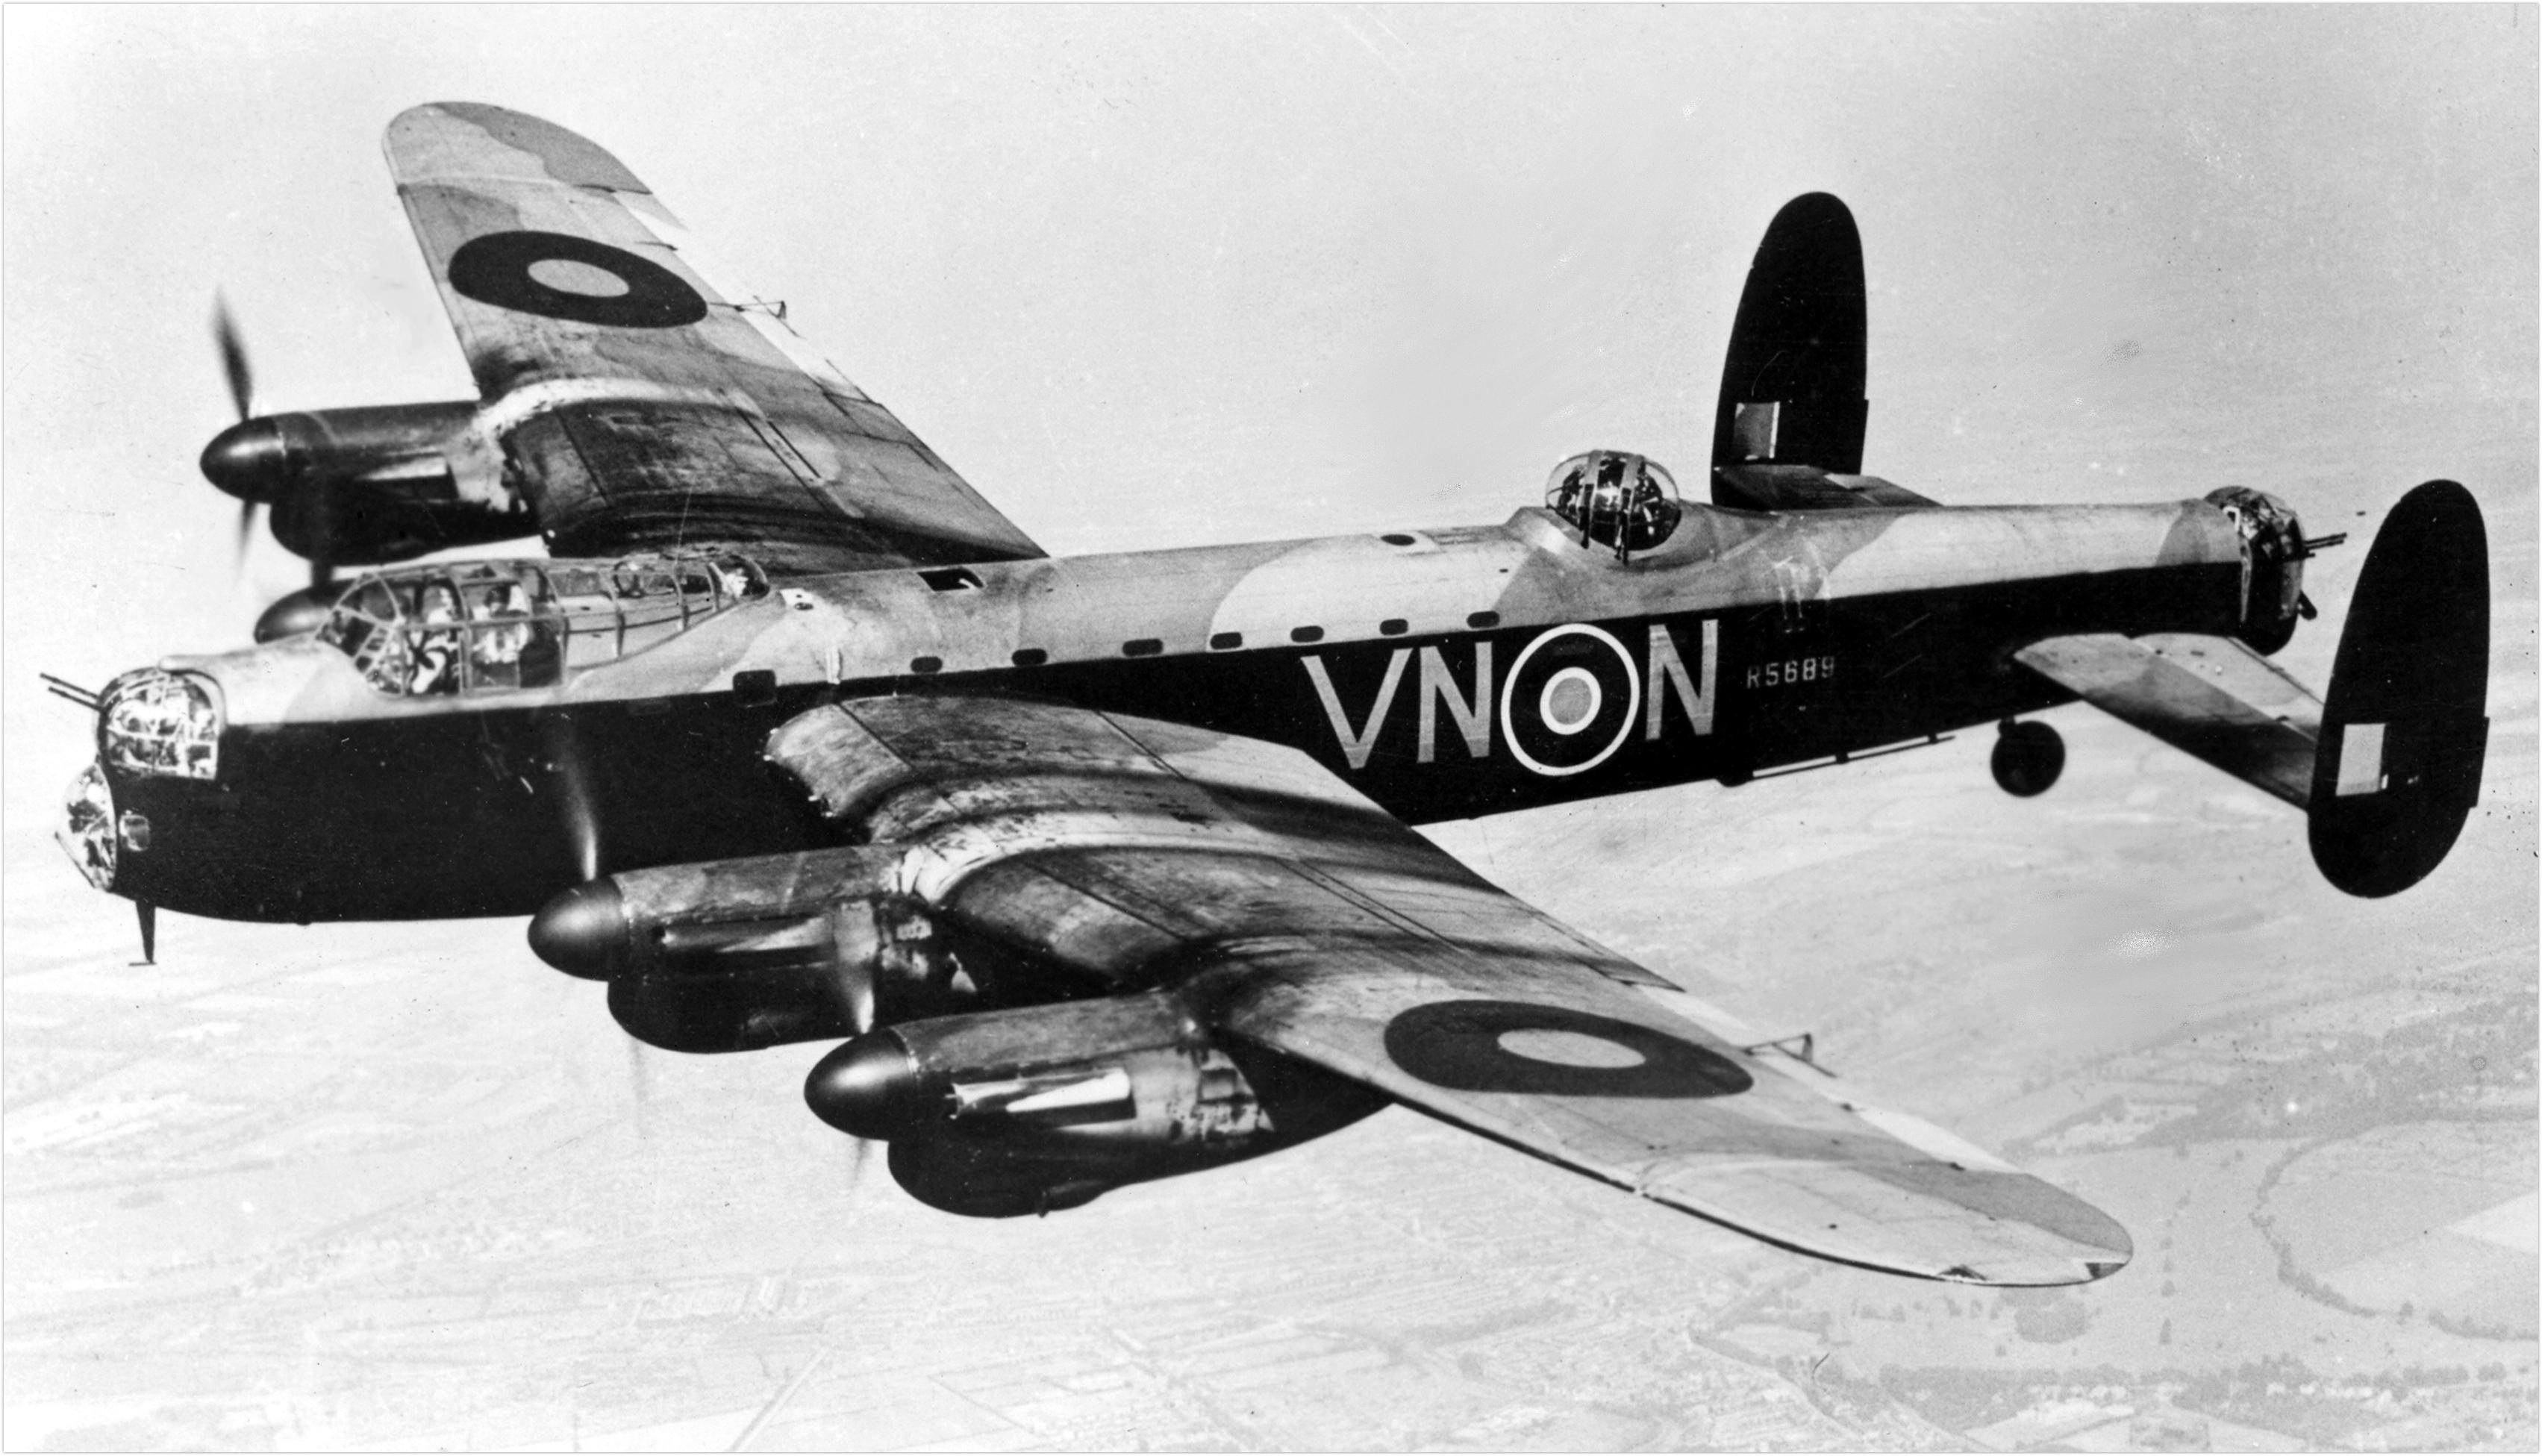 Avro 683 lancaster bi british wwii 4 engine heavy bomber overview malvernweather Choice Image